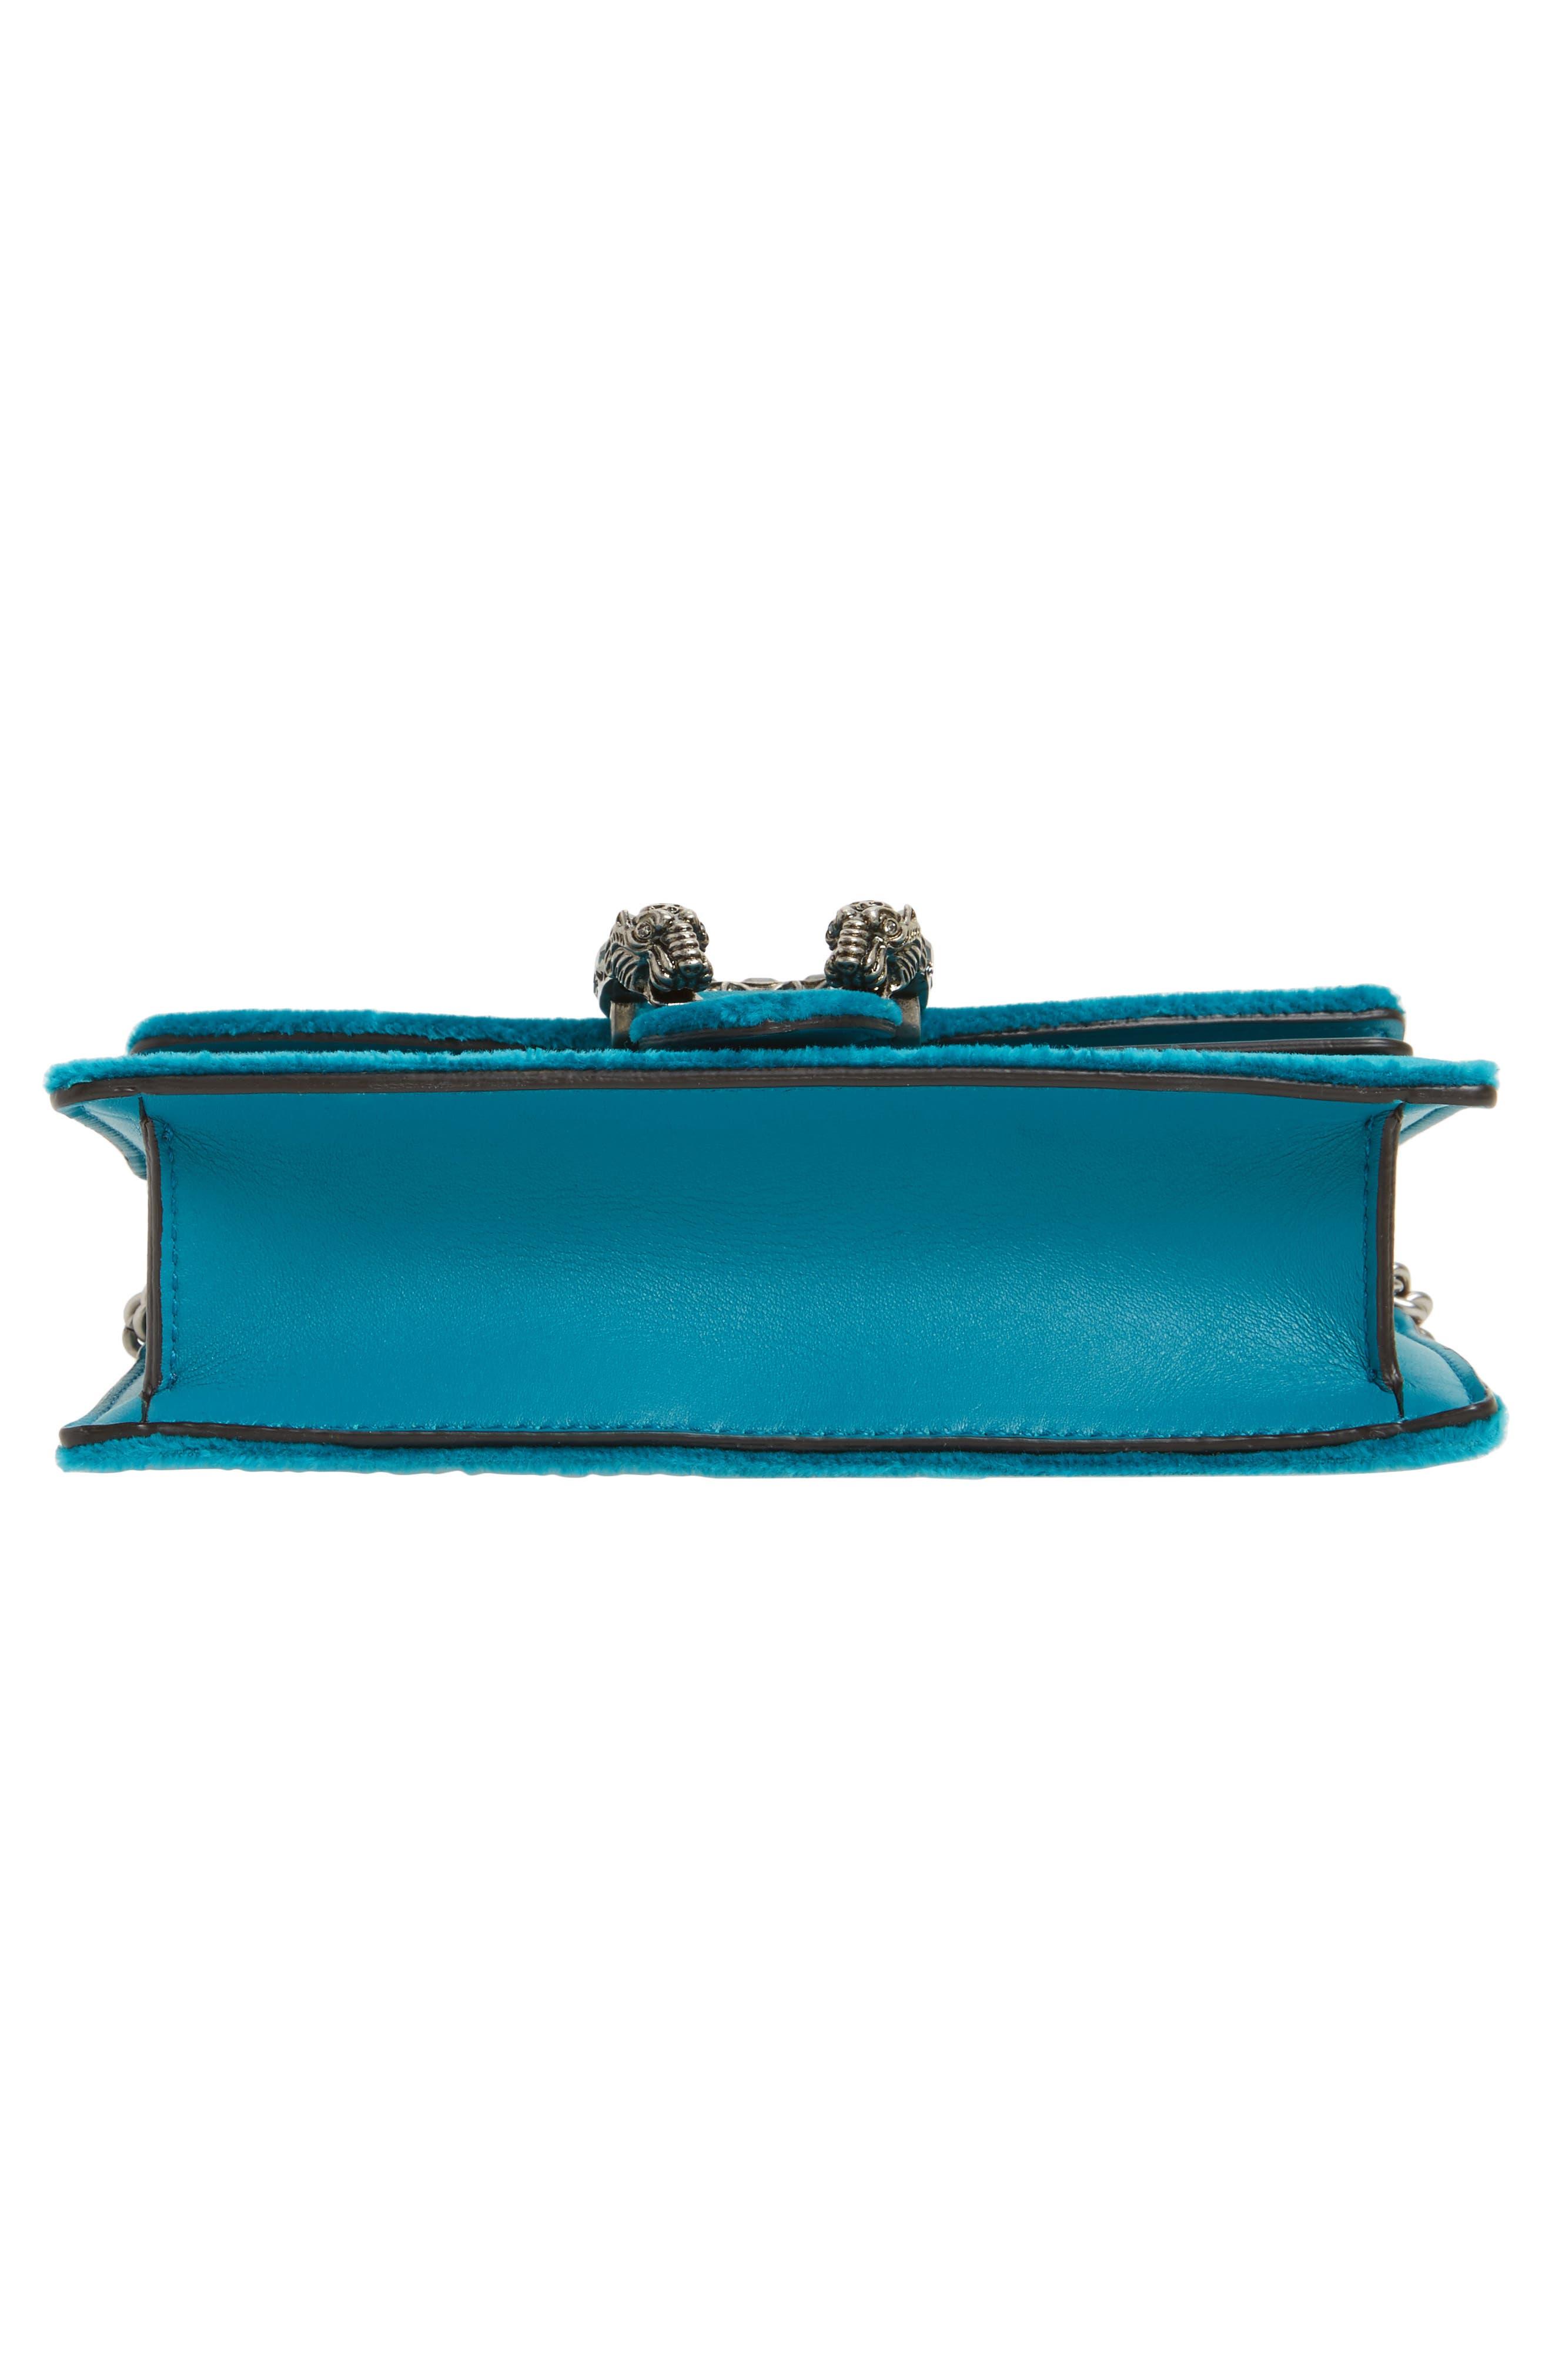 GUCCI, Super Mini Dionysus Velvet Shoulder Bag, Alternate thumbnail 6, color, PIVONE